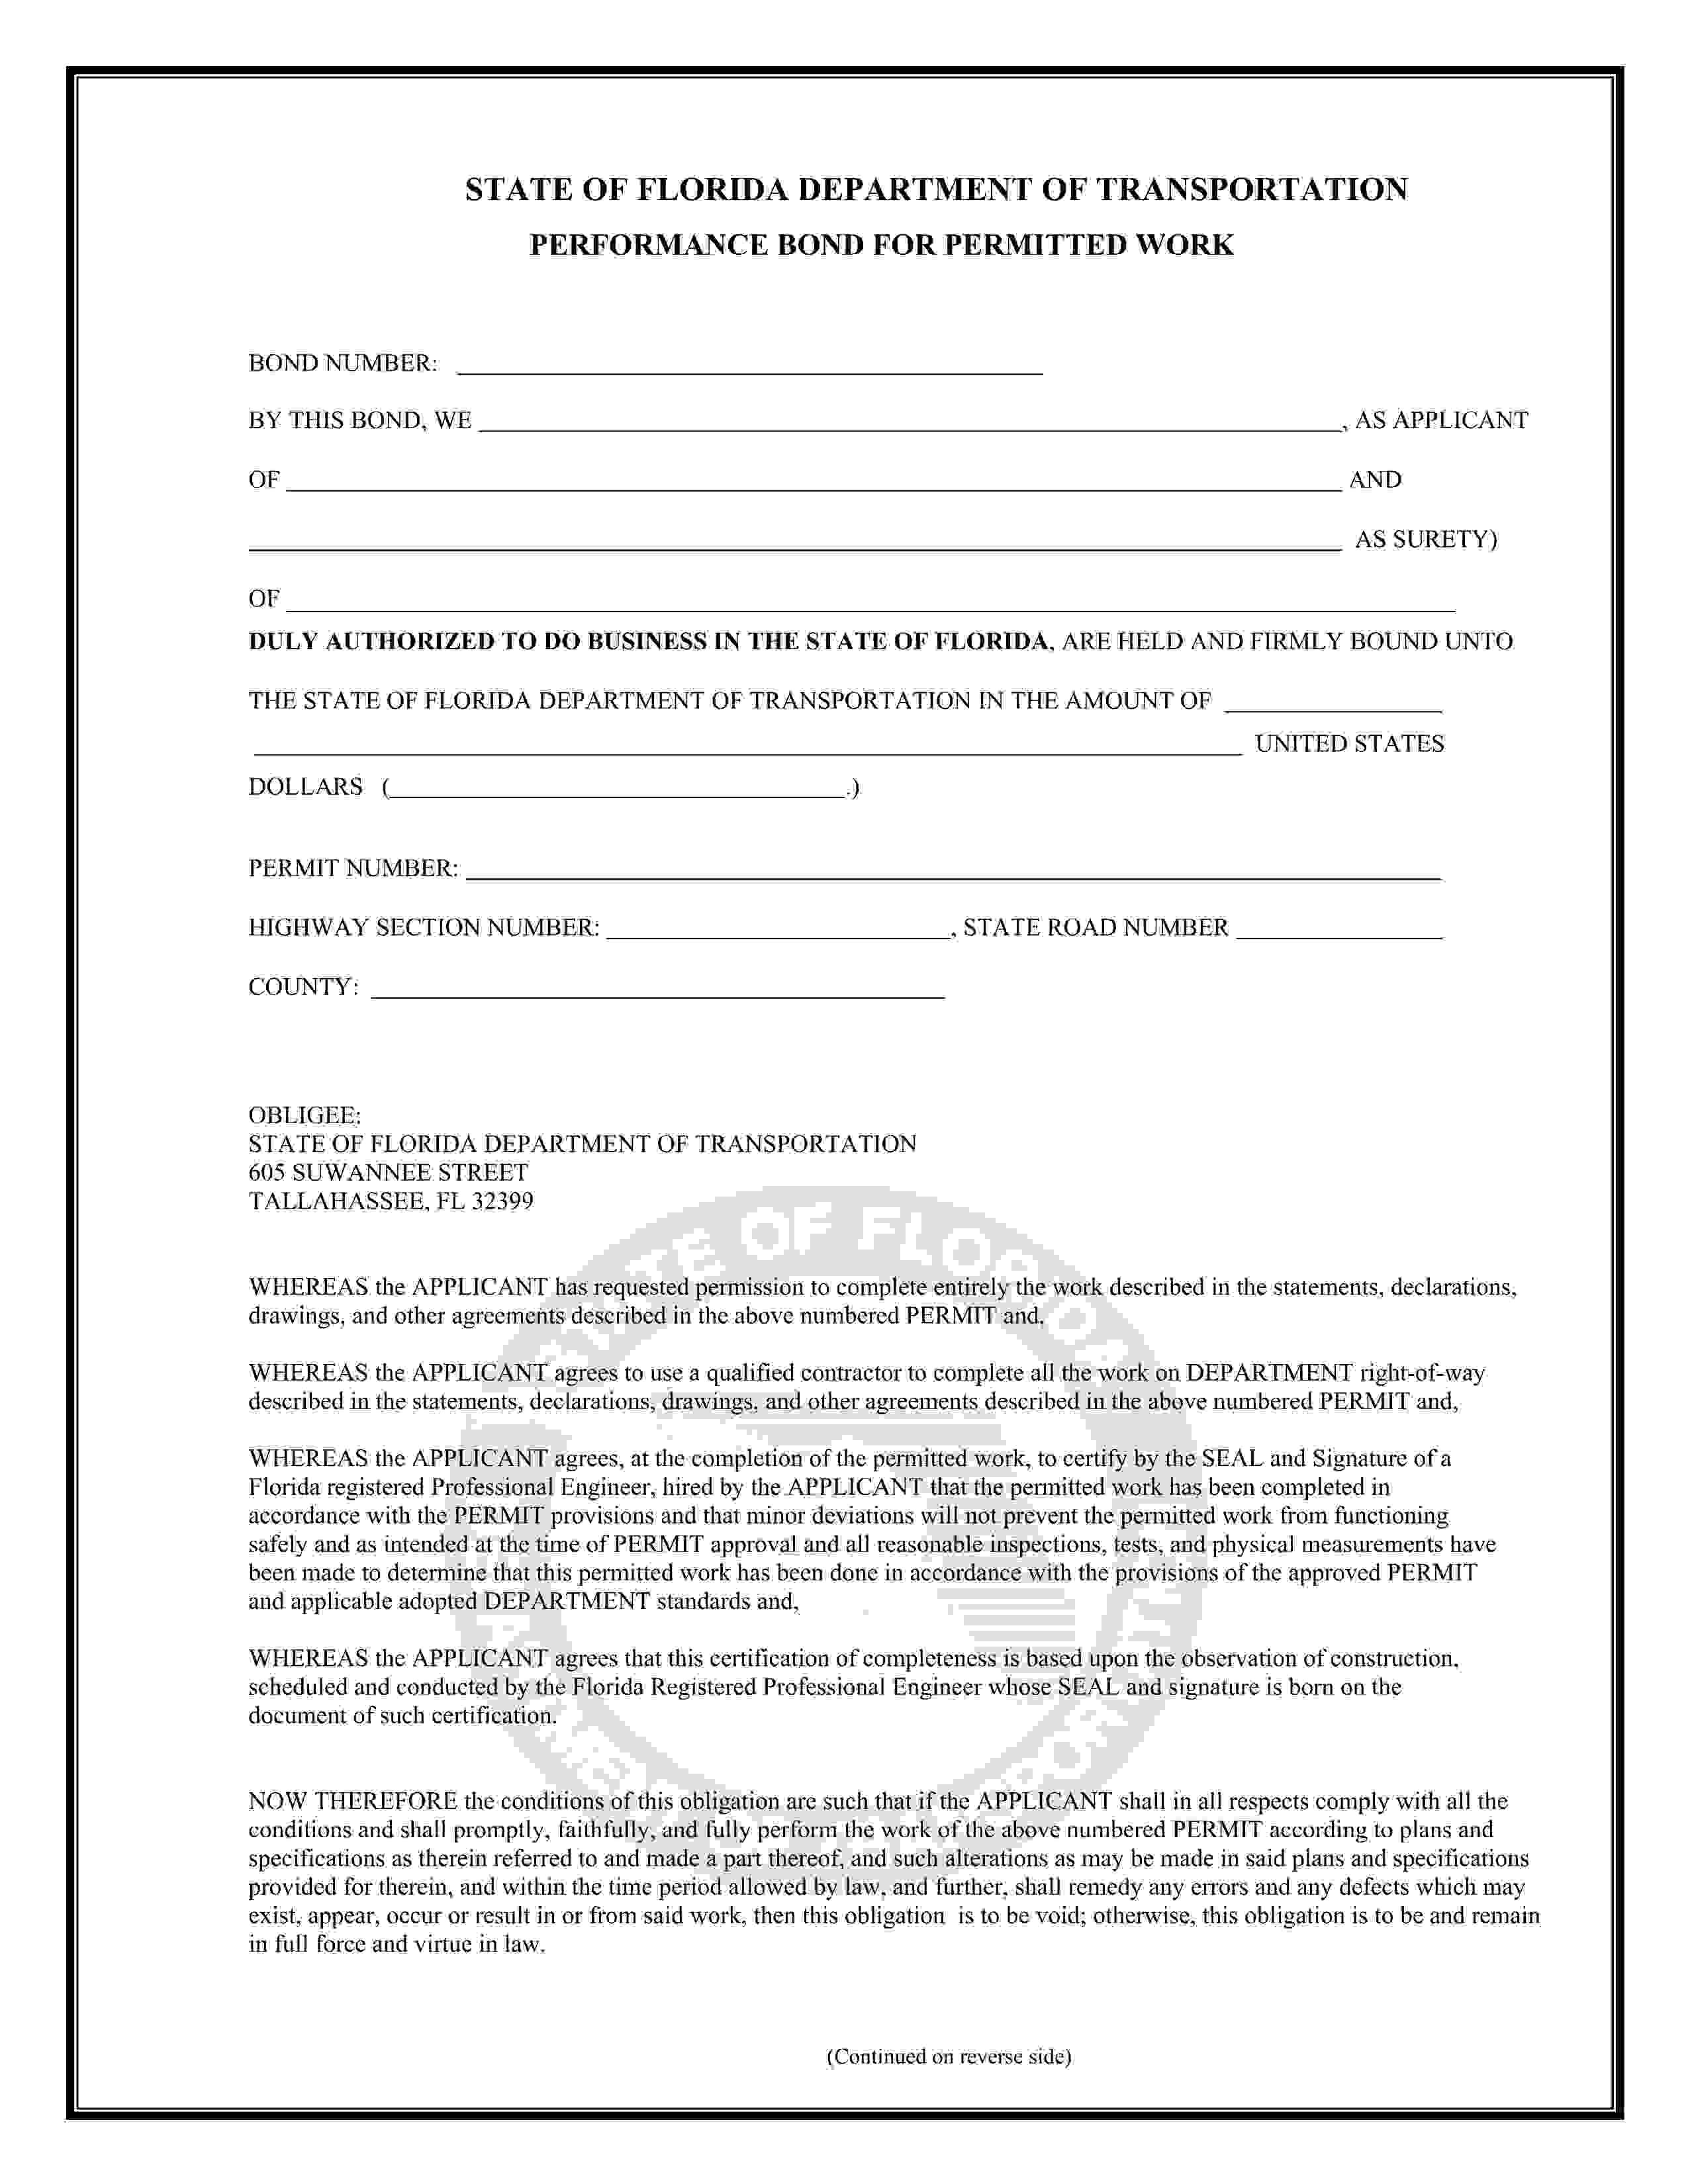 Florida Department Of Transportation Permitted Work Performance Bond sample image